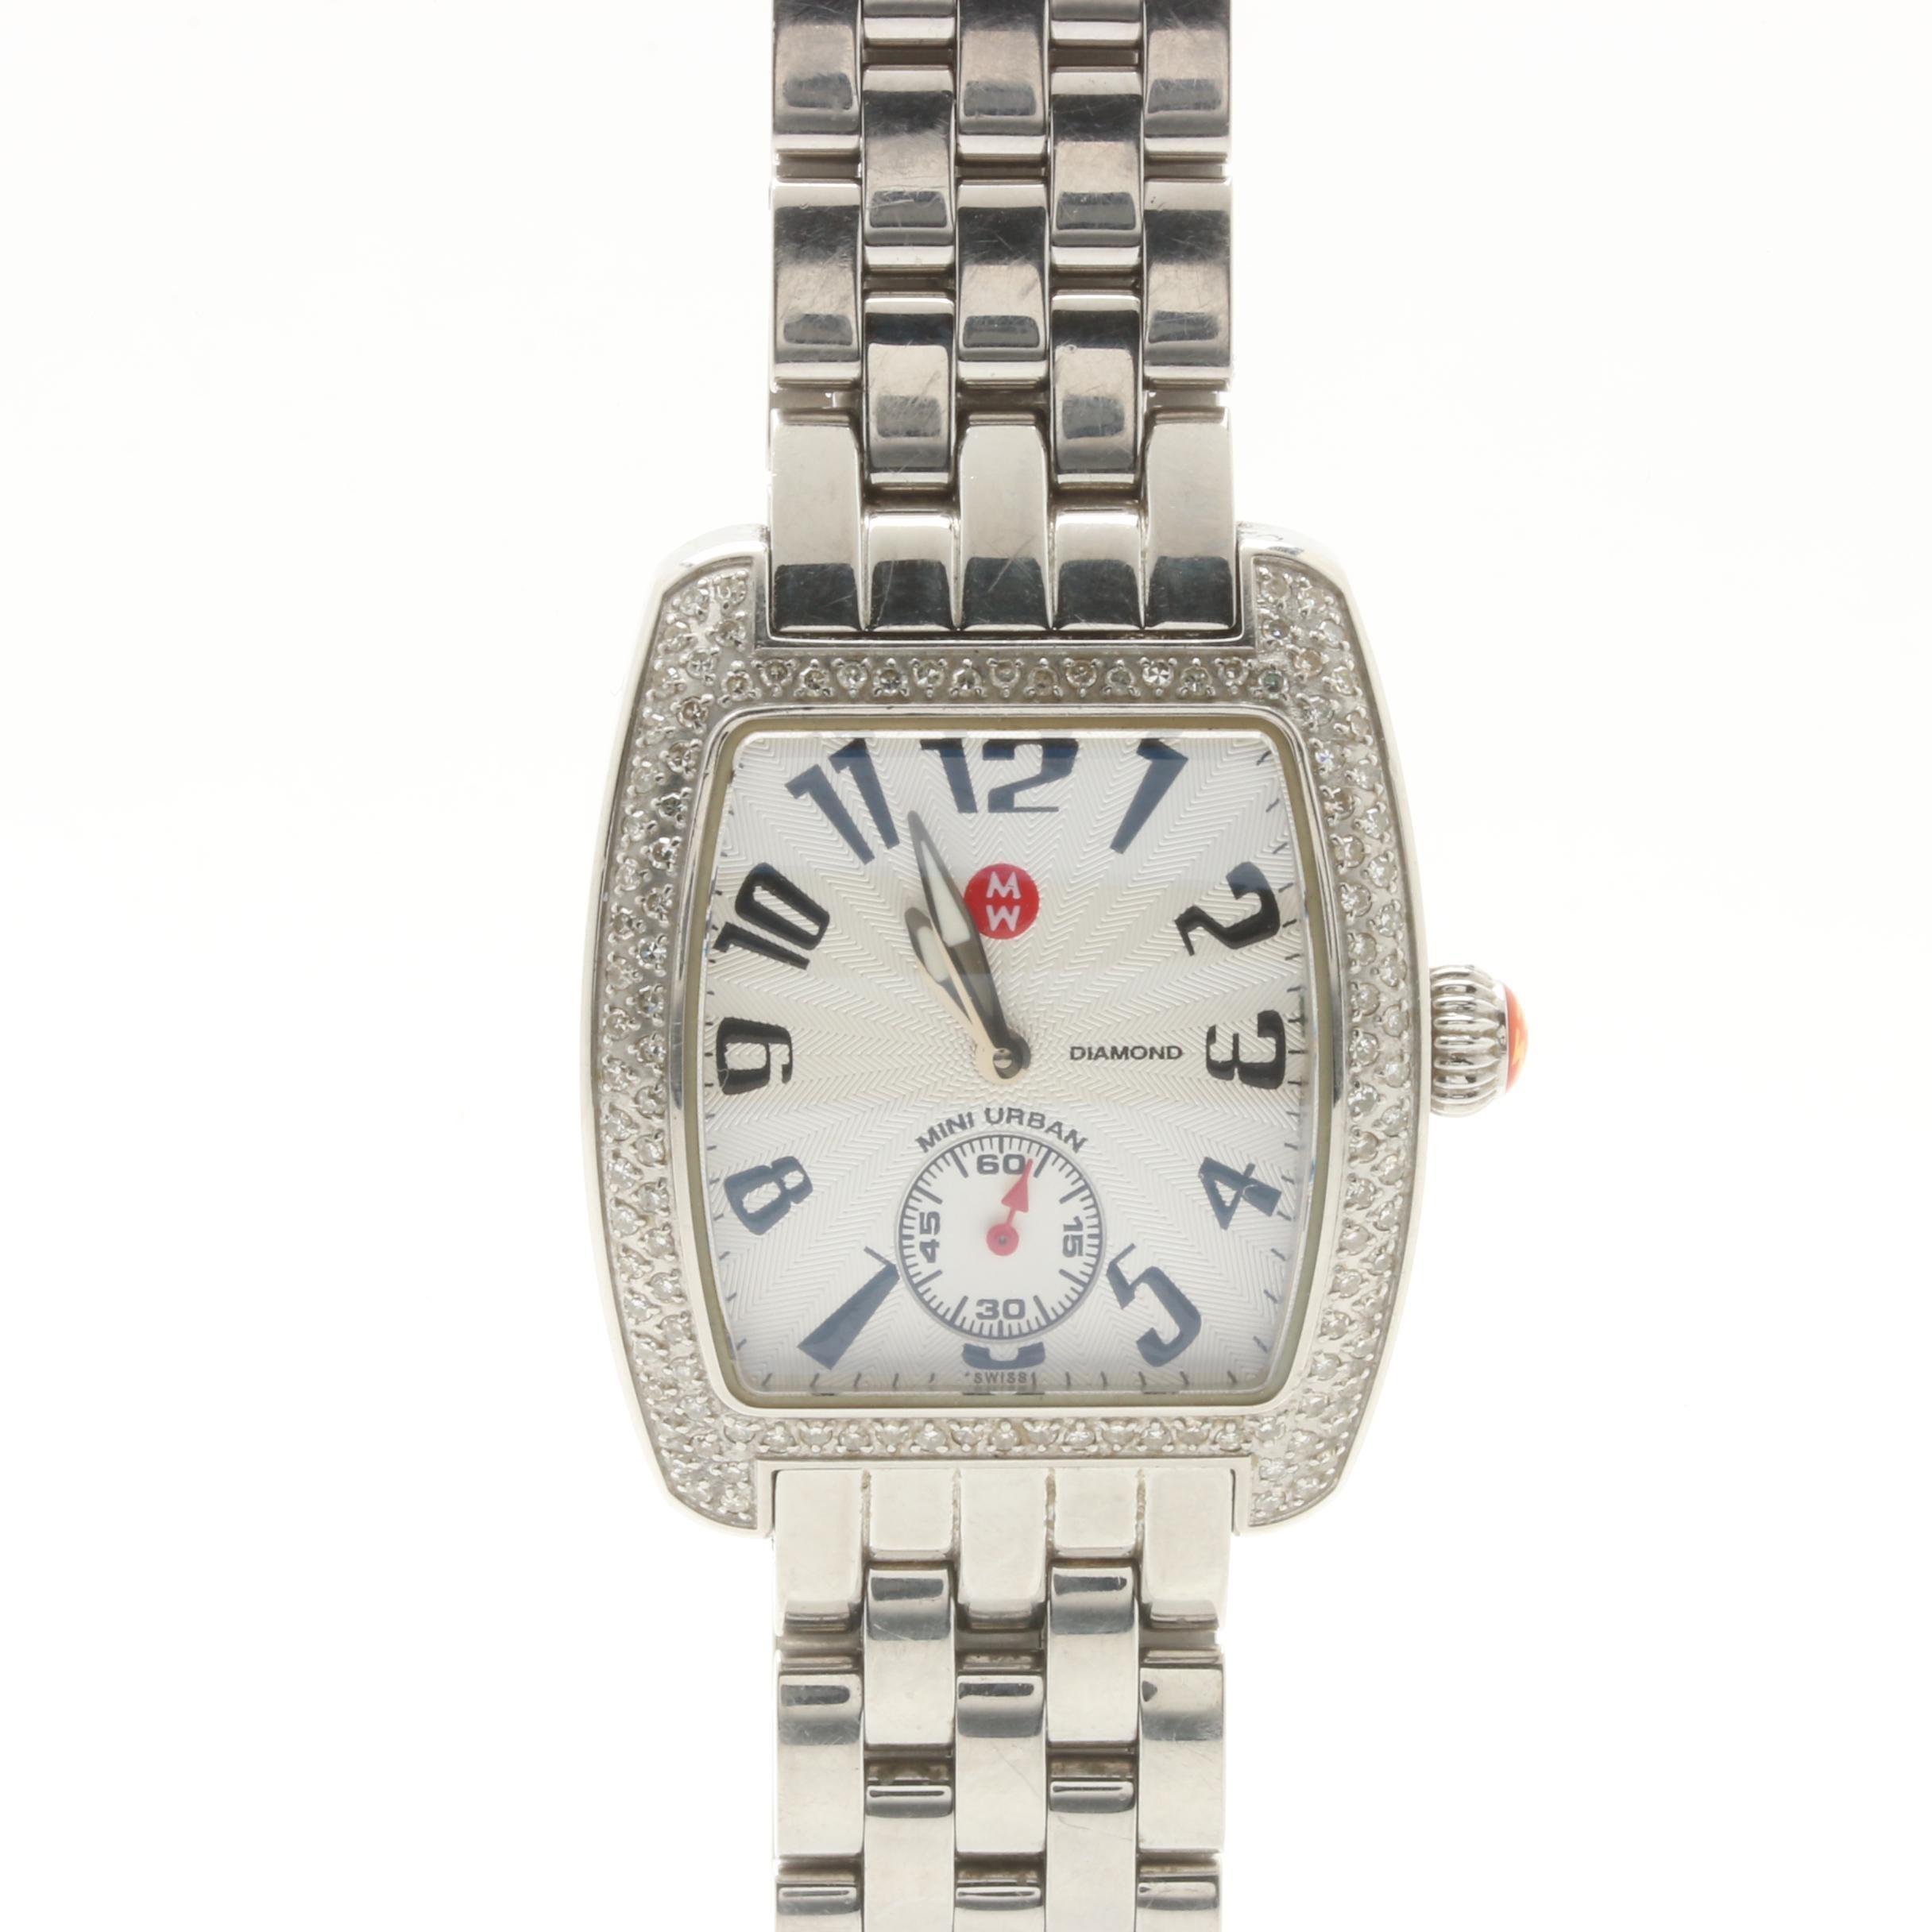 Michele Stainless Steel Diamond Bezel Wristwatch